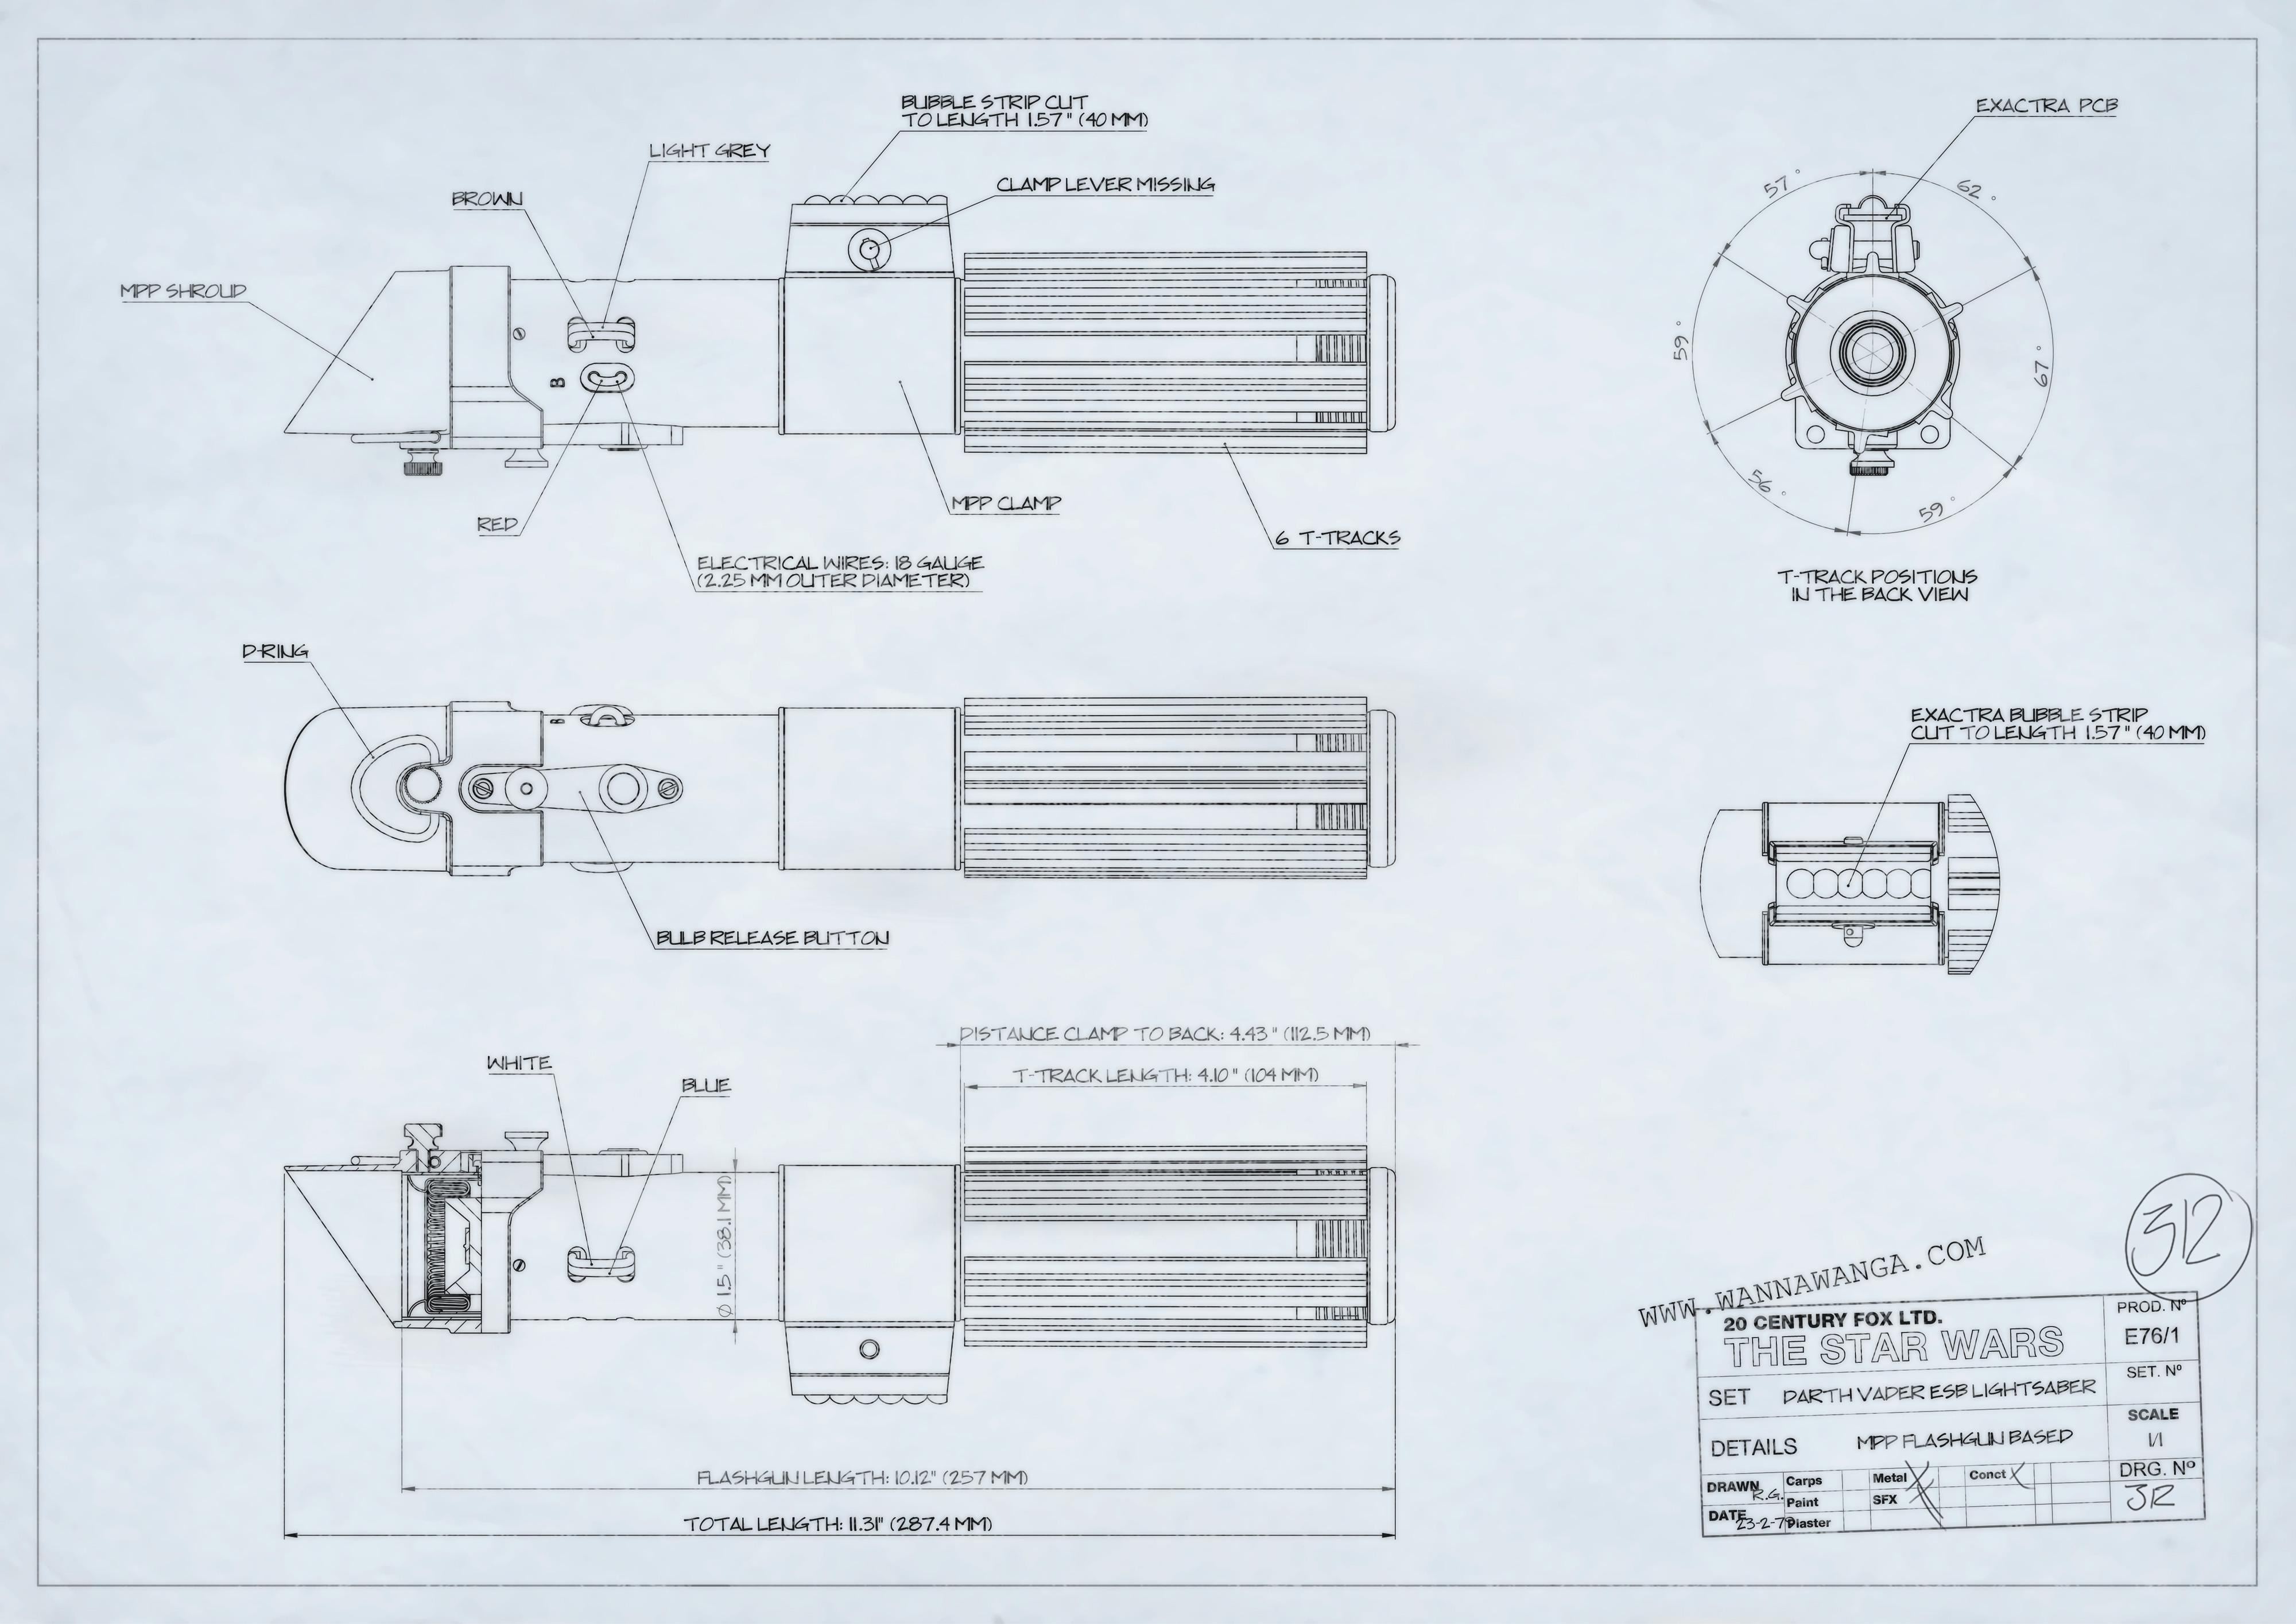 Goodies wannawanga blueprint dv esb malvernweather Gallery